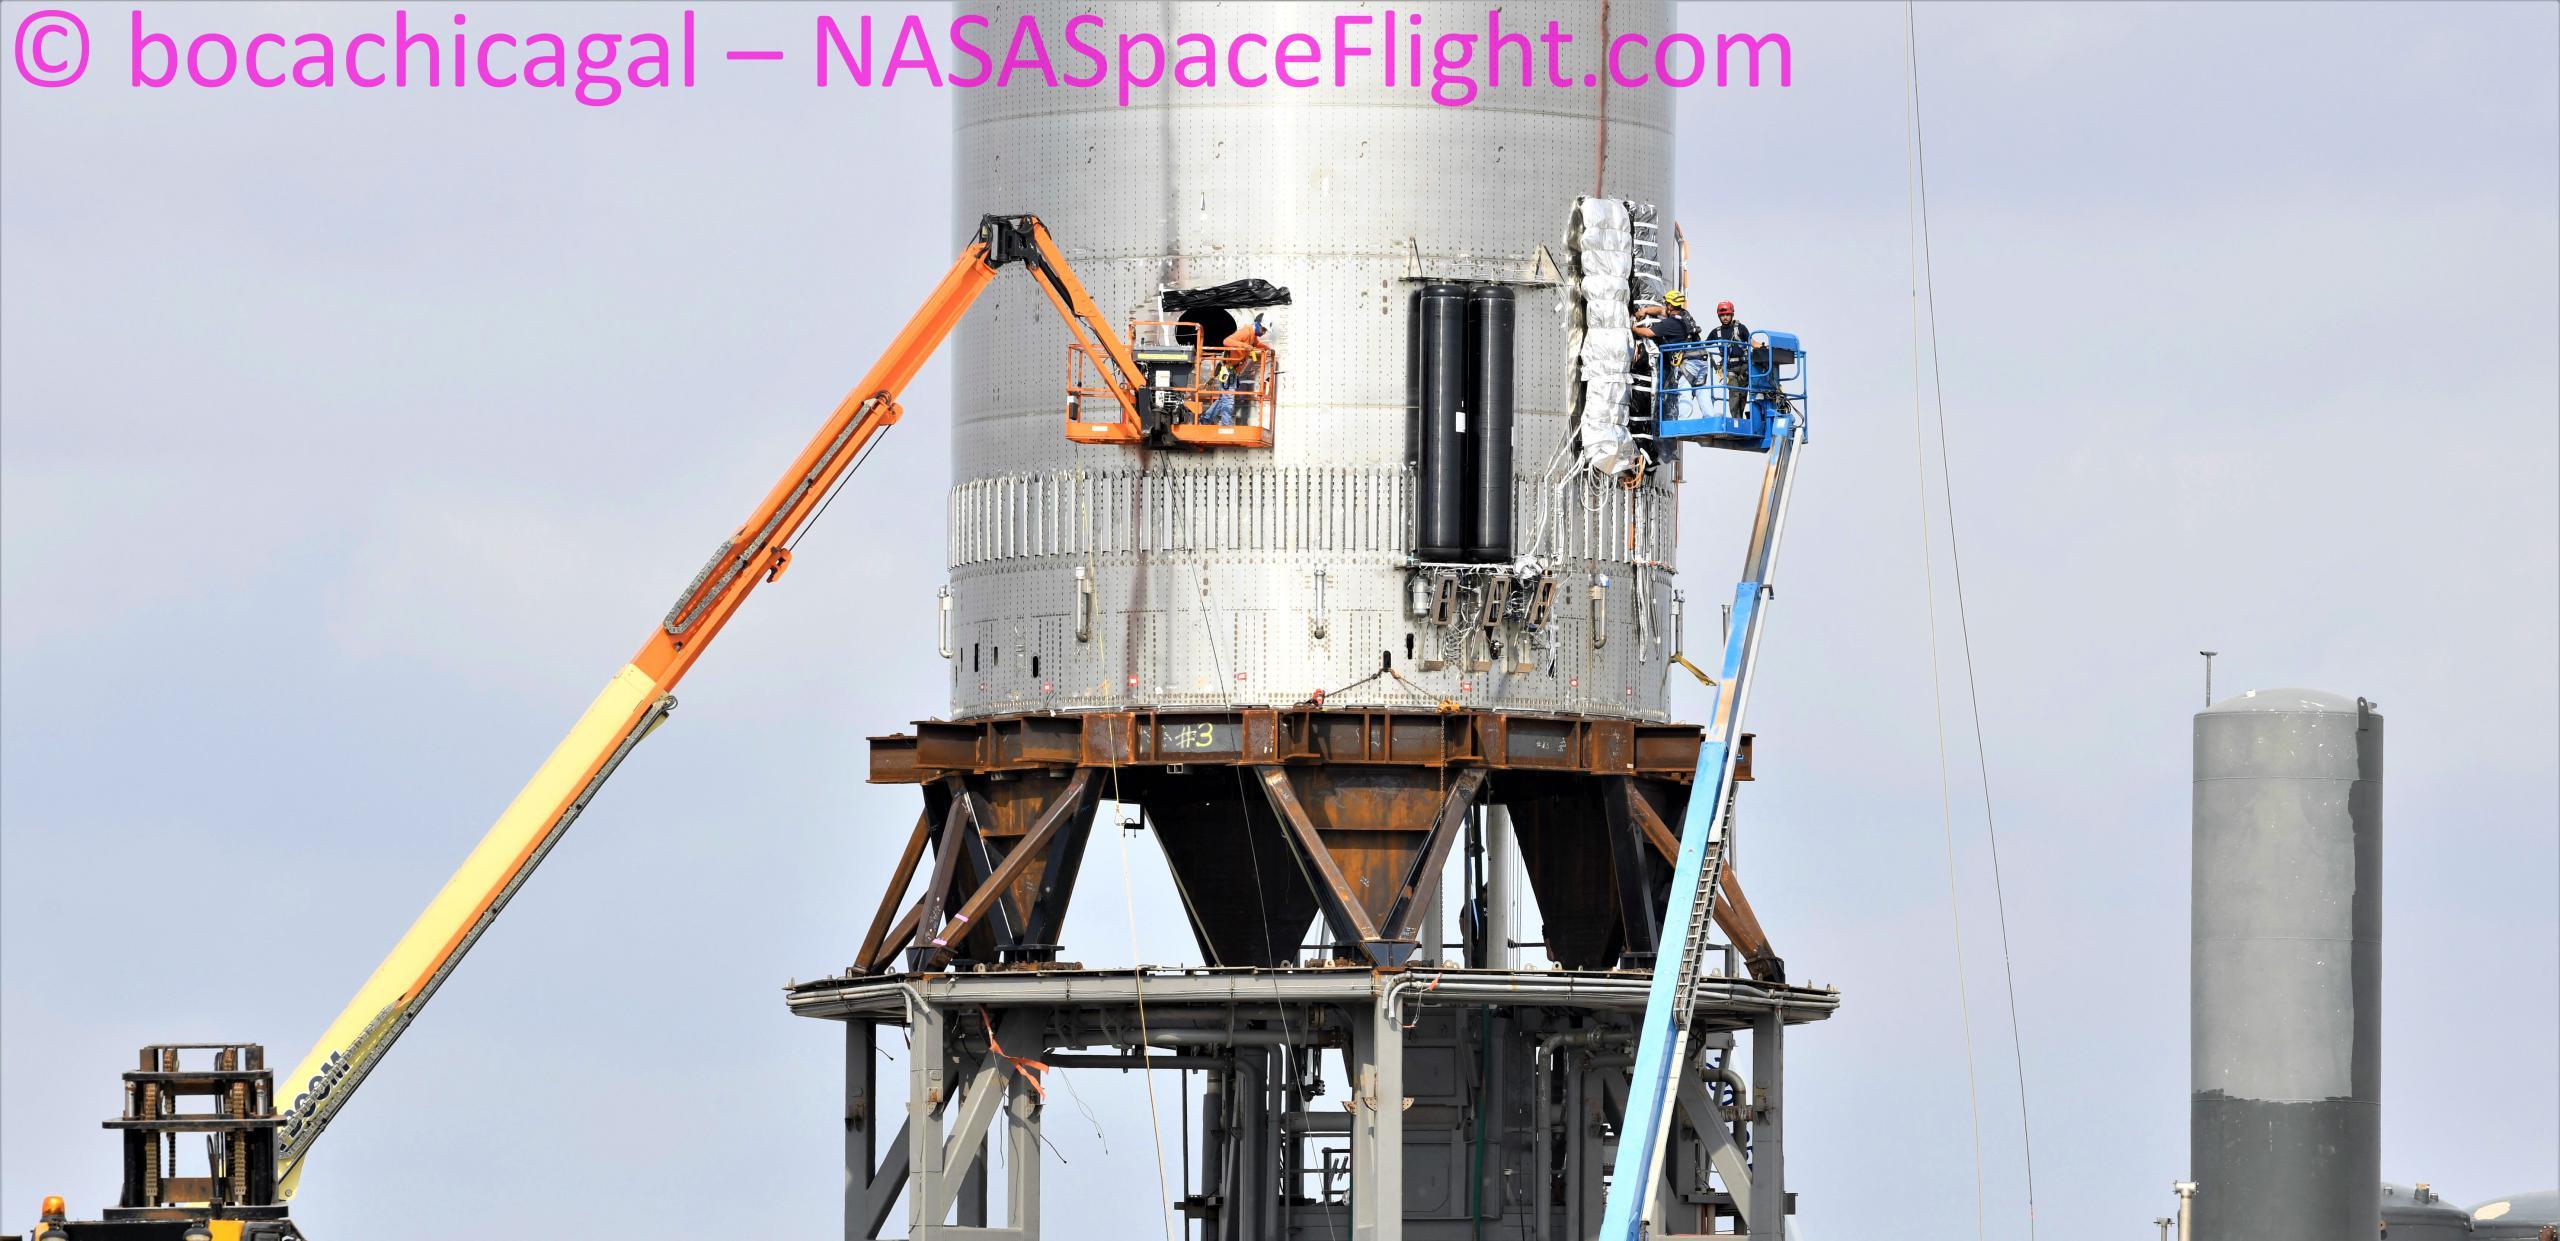 Starship Boca Chica 070621 (NASASpaceflight – bocachicagal) B3 pad work 1 crop (c)